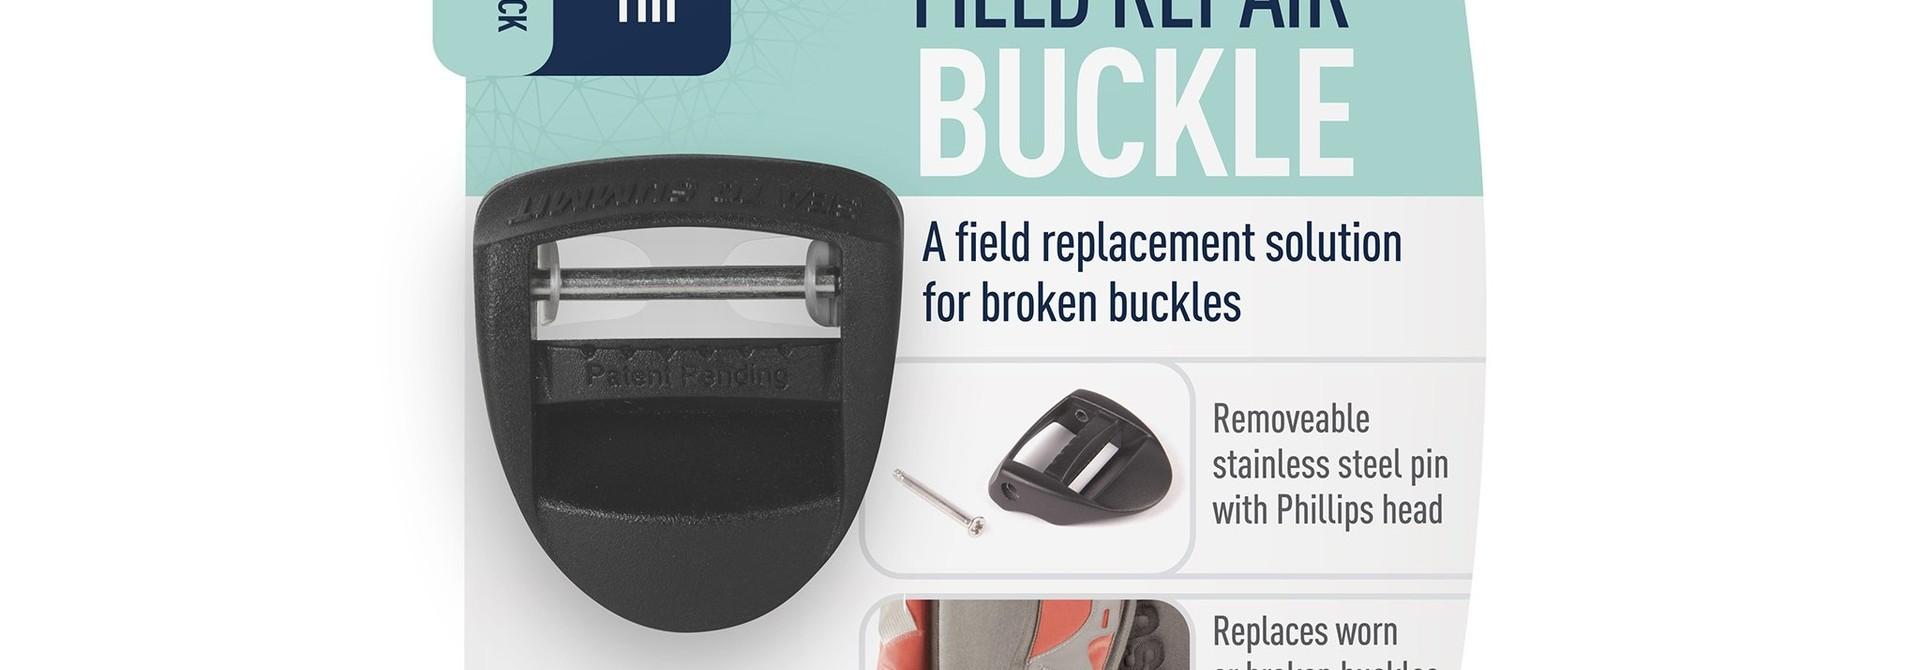 "Field Repair Buckle 25mm / 1"" Ladderlock 1 Pin"